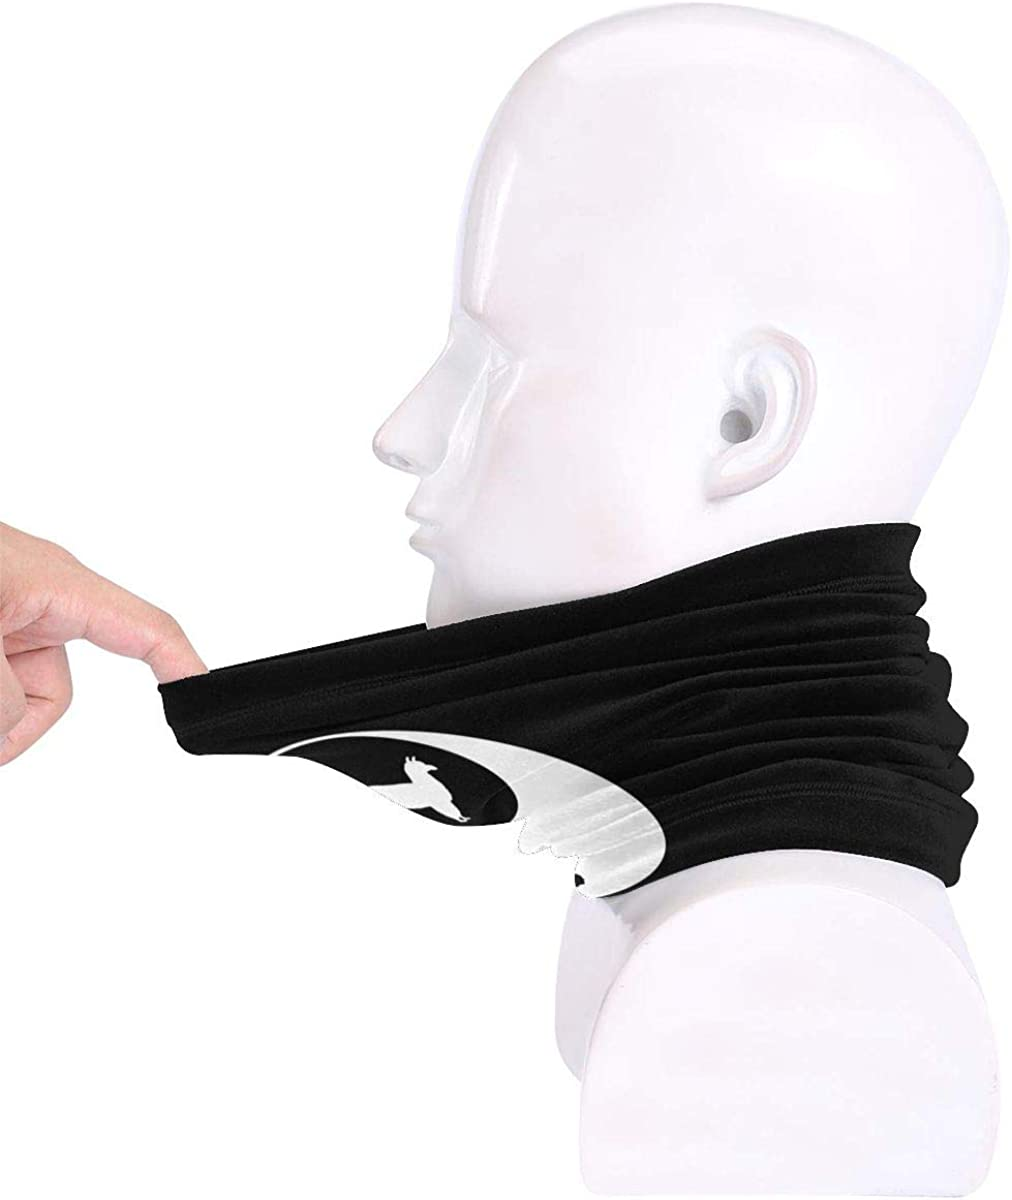 Yin Yang Llama Men /& Women Face Mask Windproof Neck Gaiter Cold Weather Headwear For Fishing Motorcycling